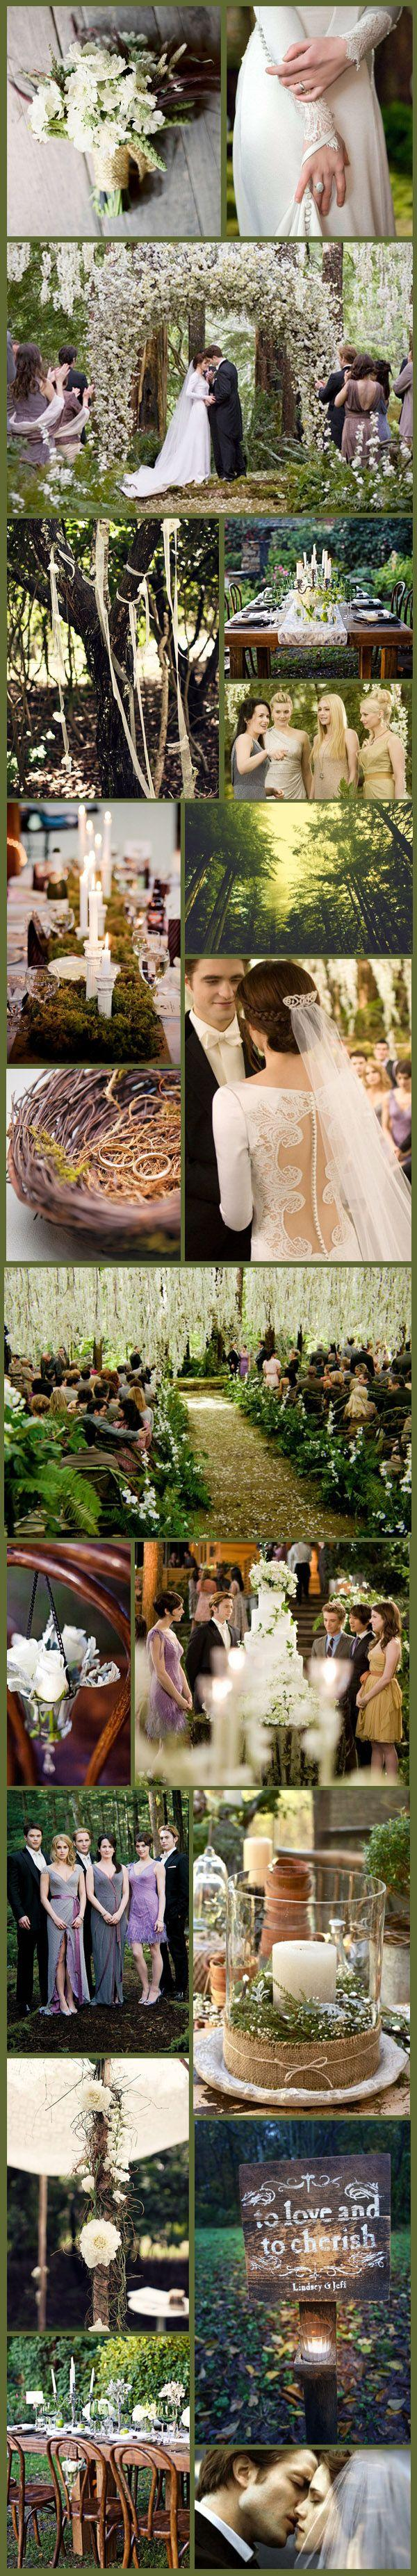 Hochzeit - Wednesday Wedding Inspiration: Twilight Time - New